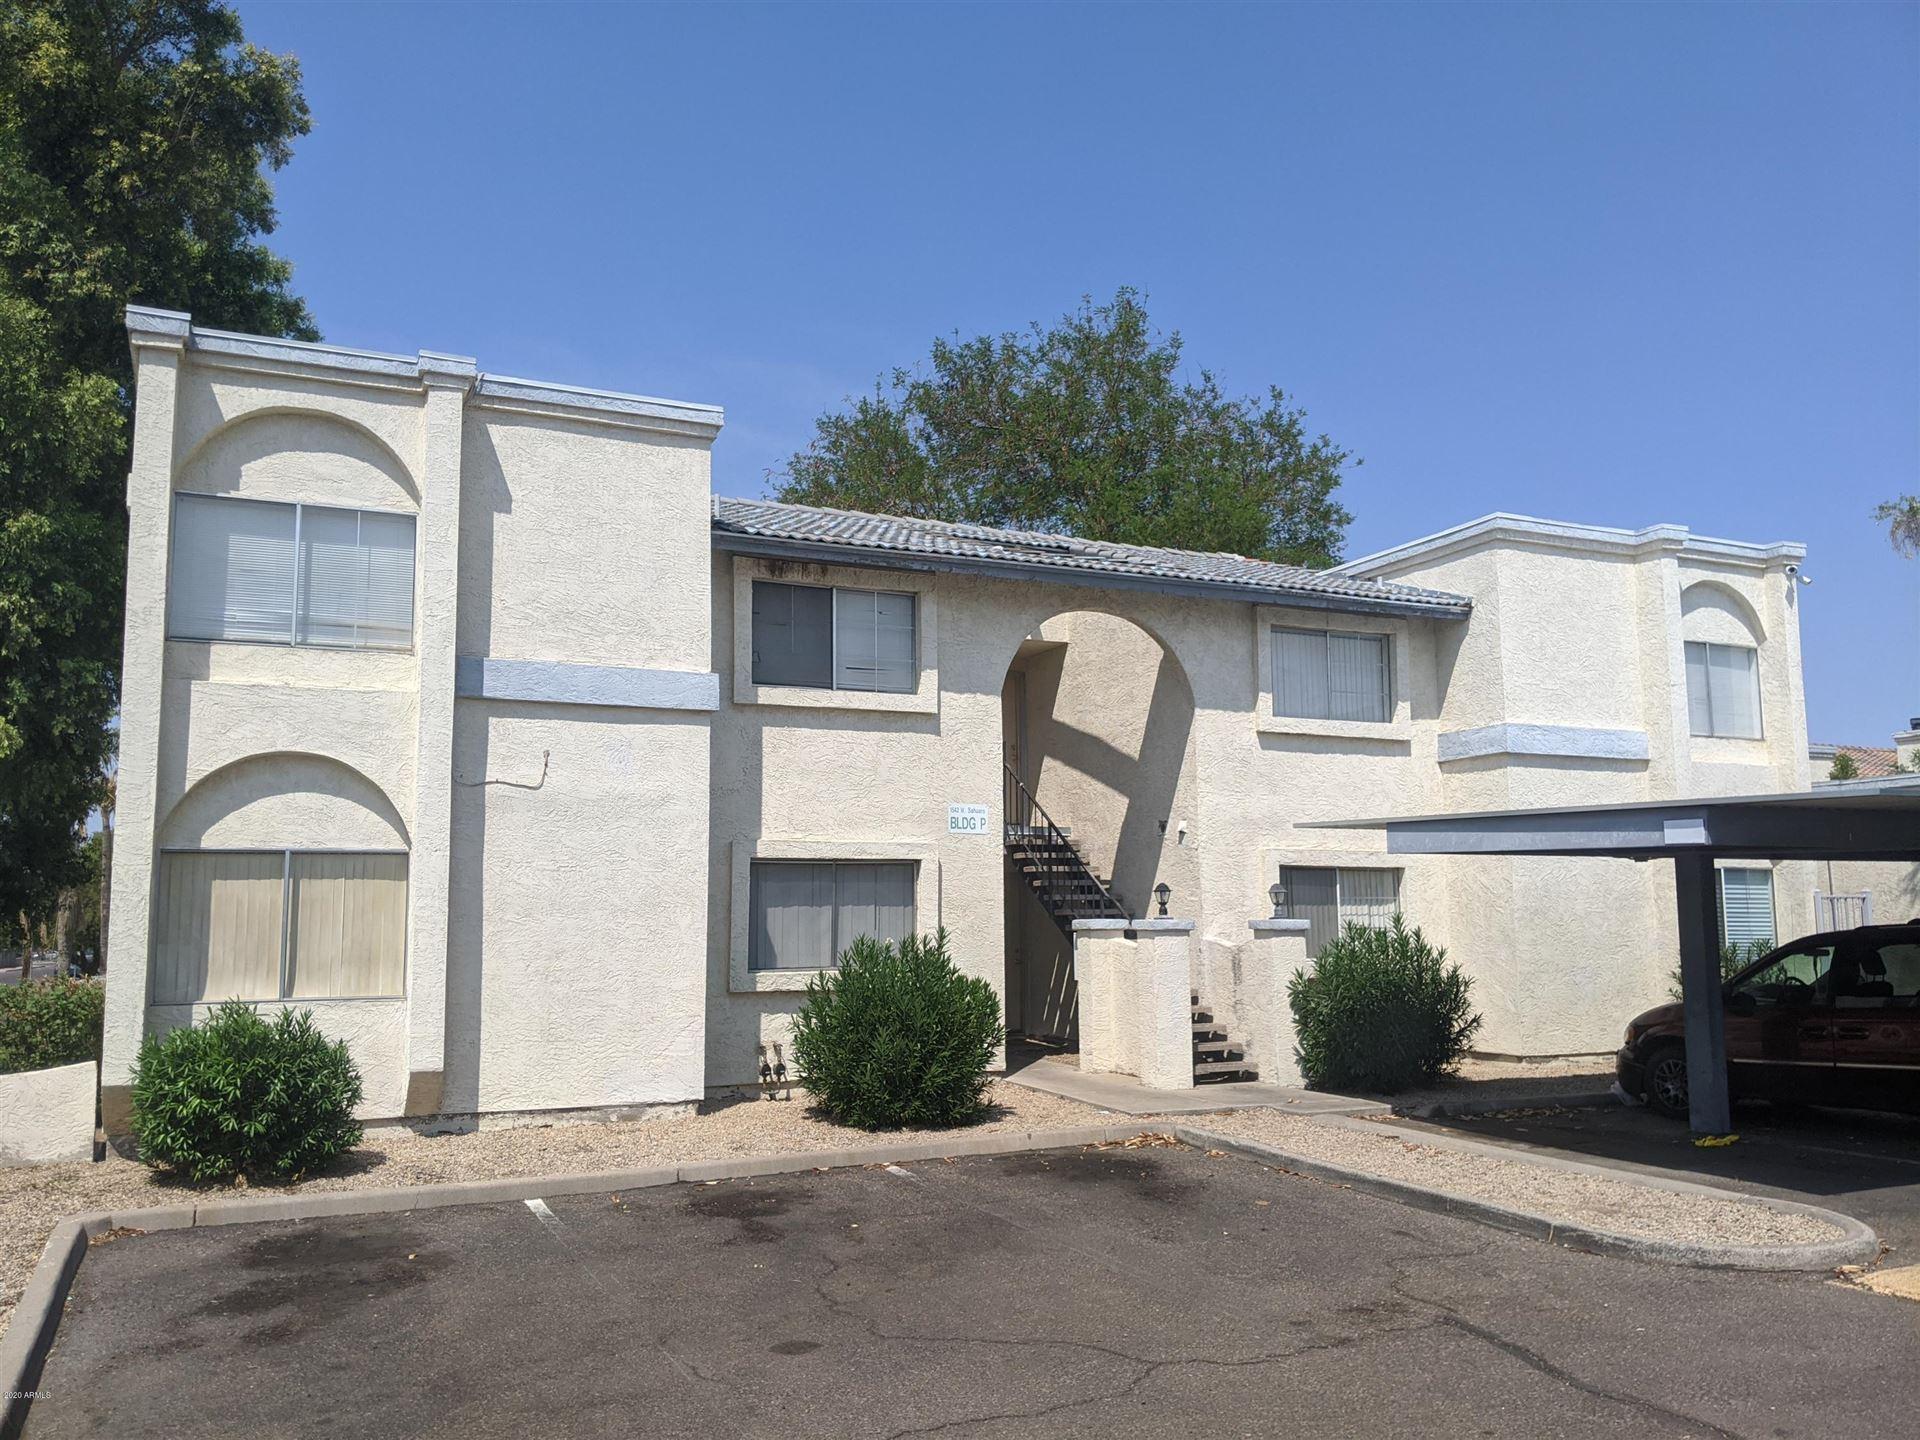 1542 W SAHUARO Drive, Phoenix, AZ 85029 - MLS#: 6121885